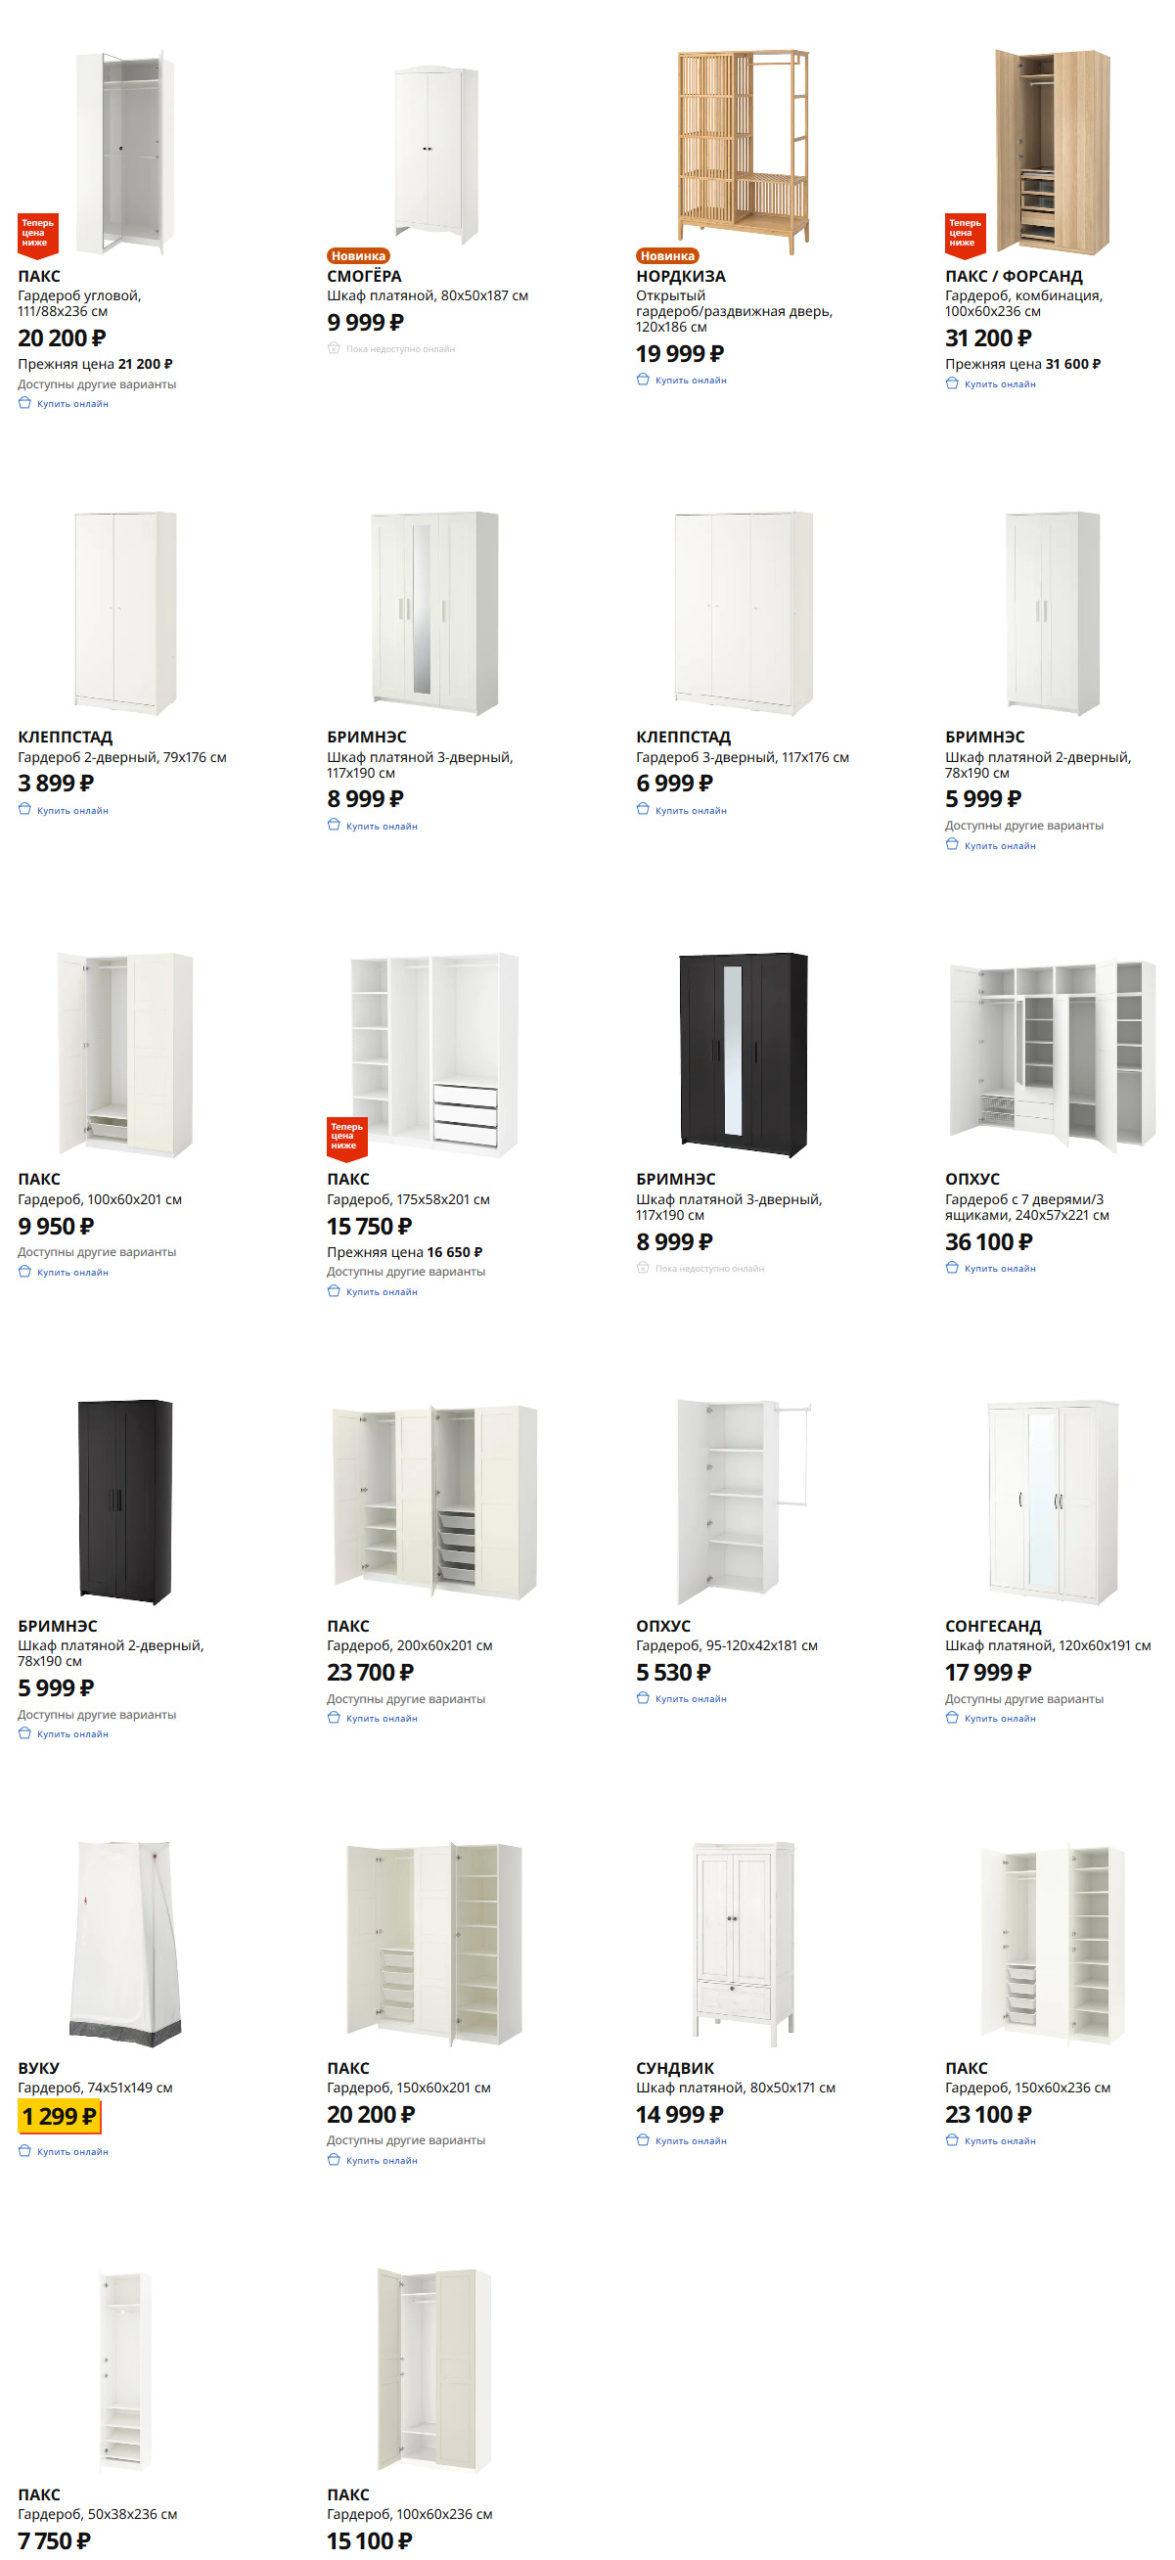 Шкафы-купе и шкафы для одежды Икеа